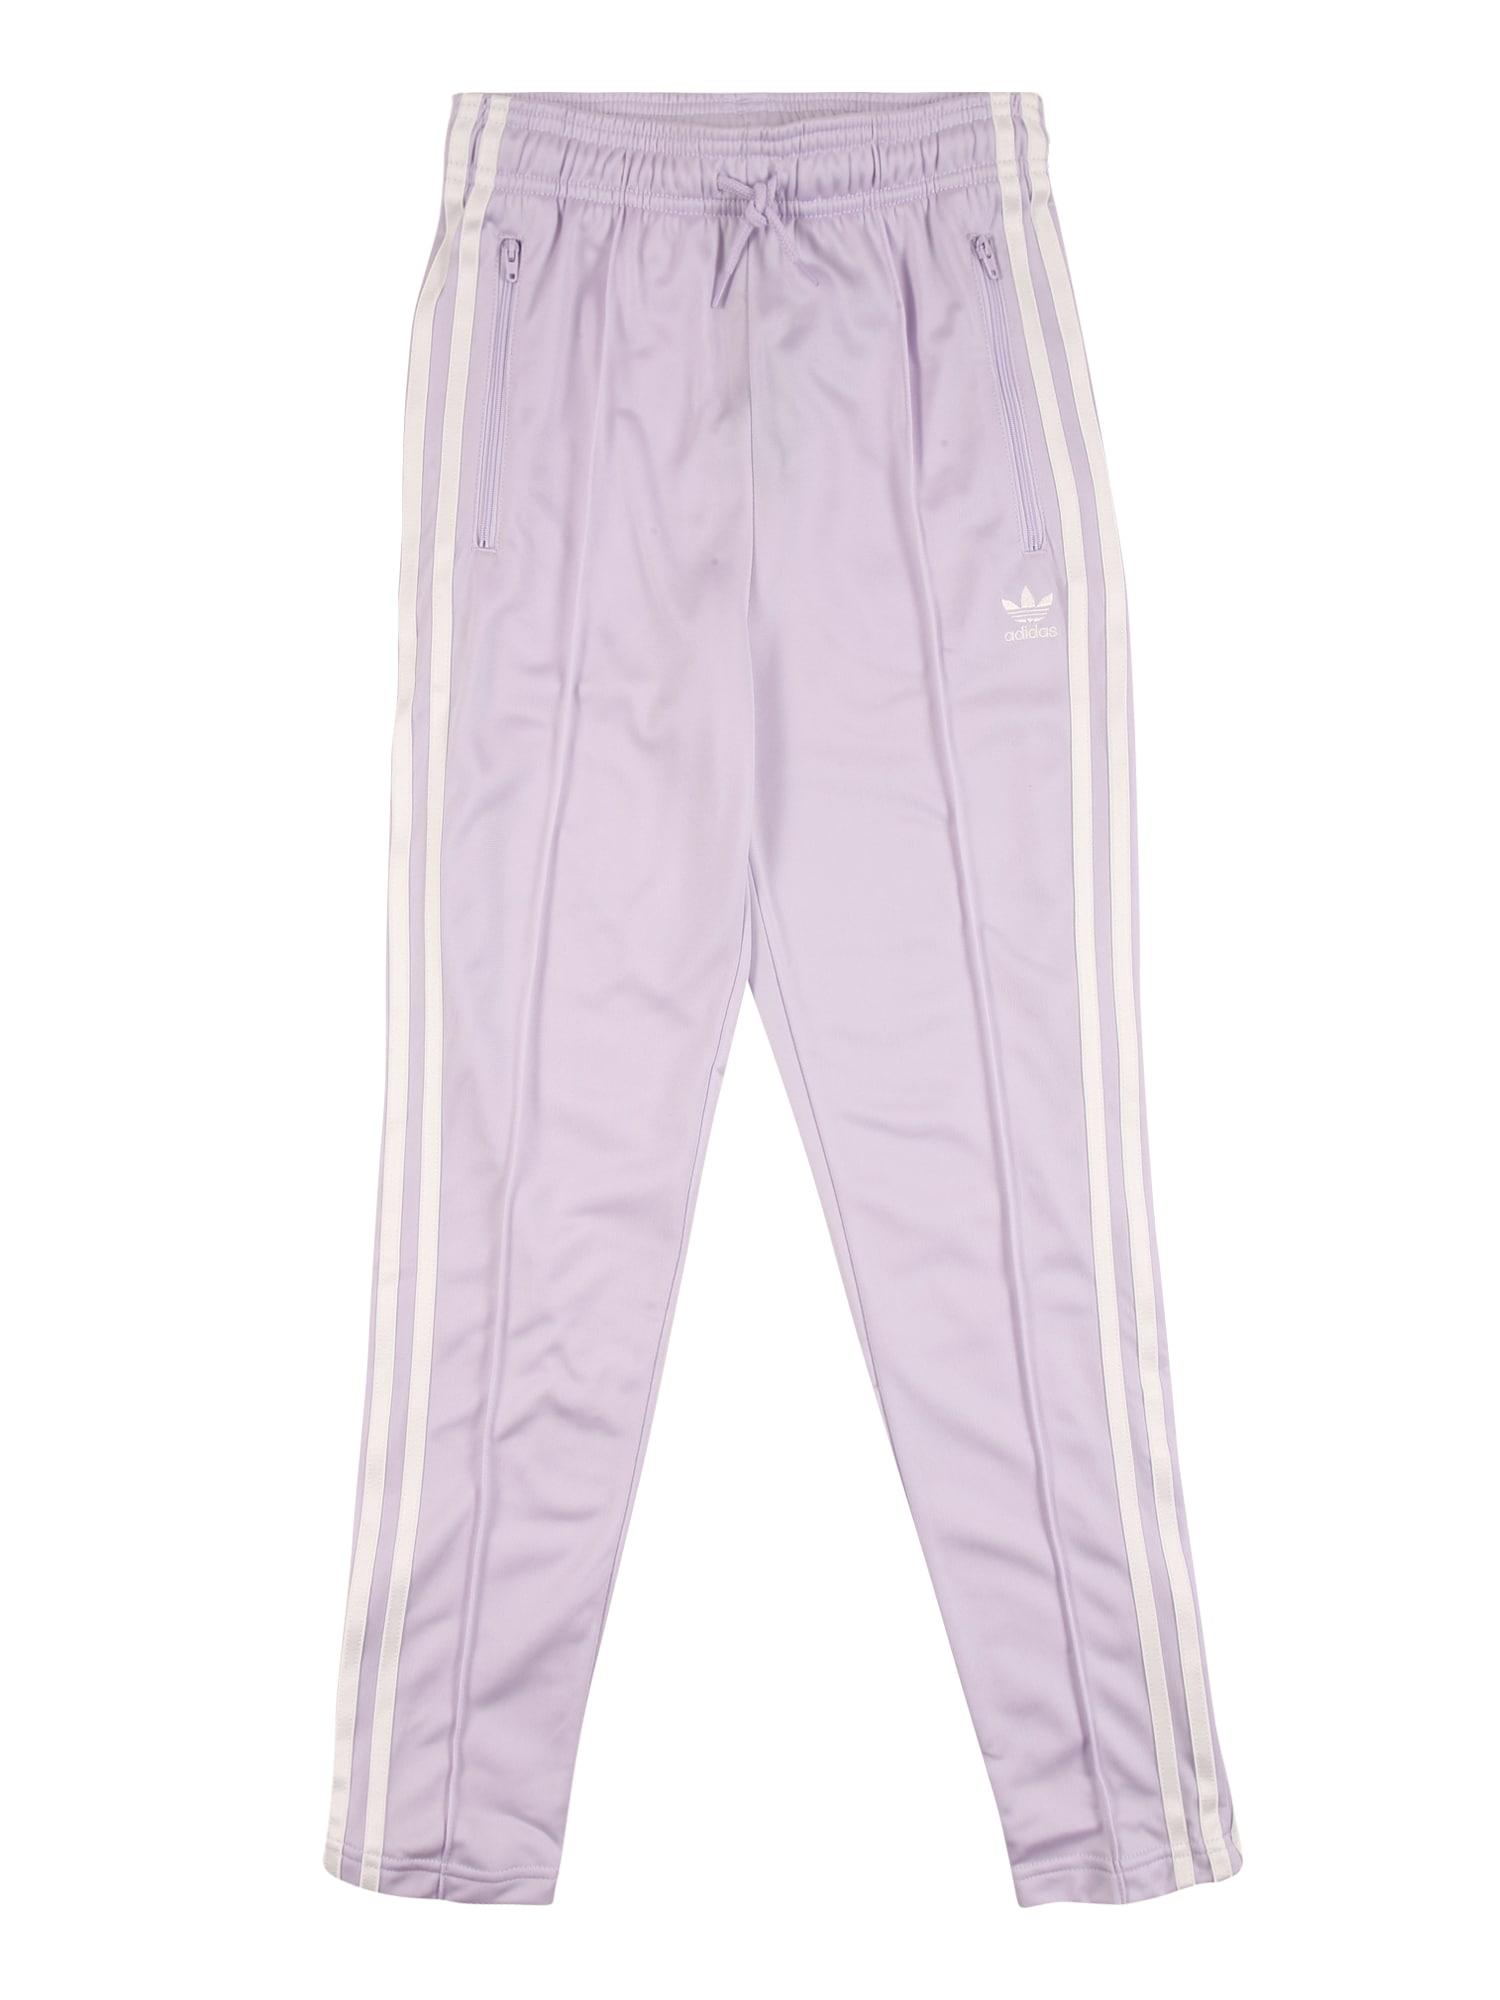 ADIDAS ORIGINALS Kalhoty  bílá / fialová